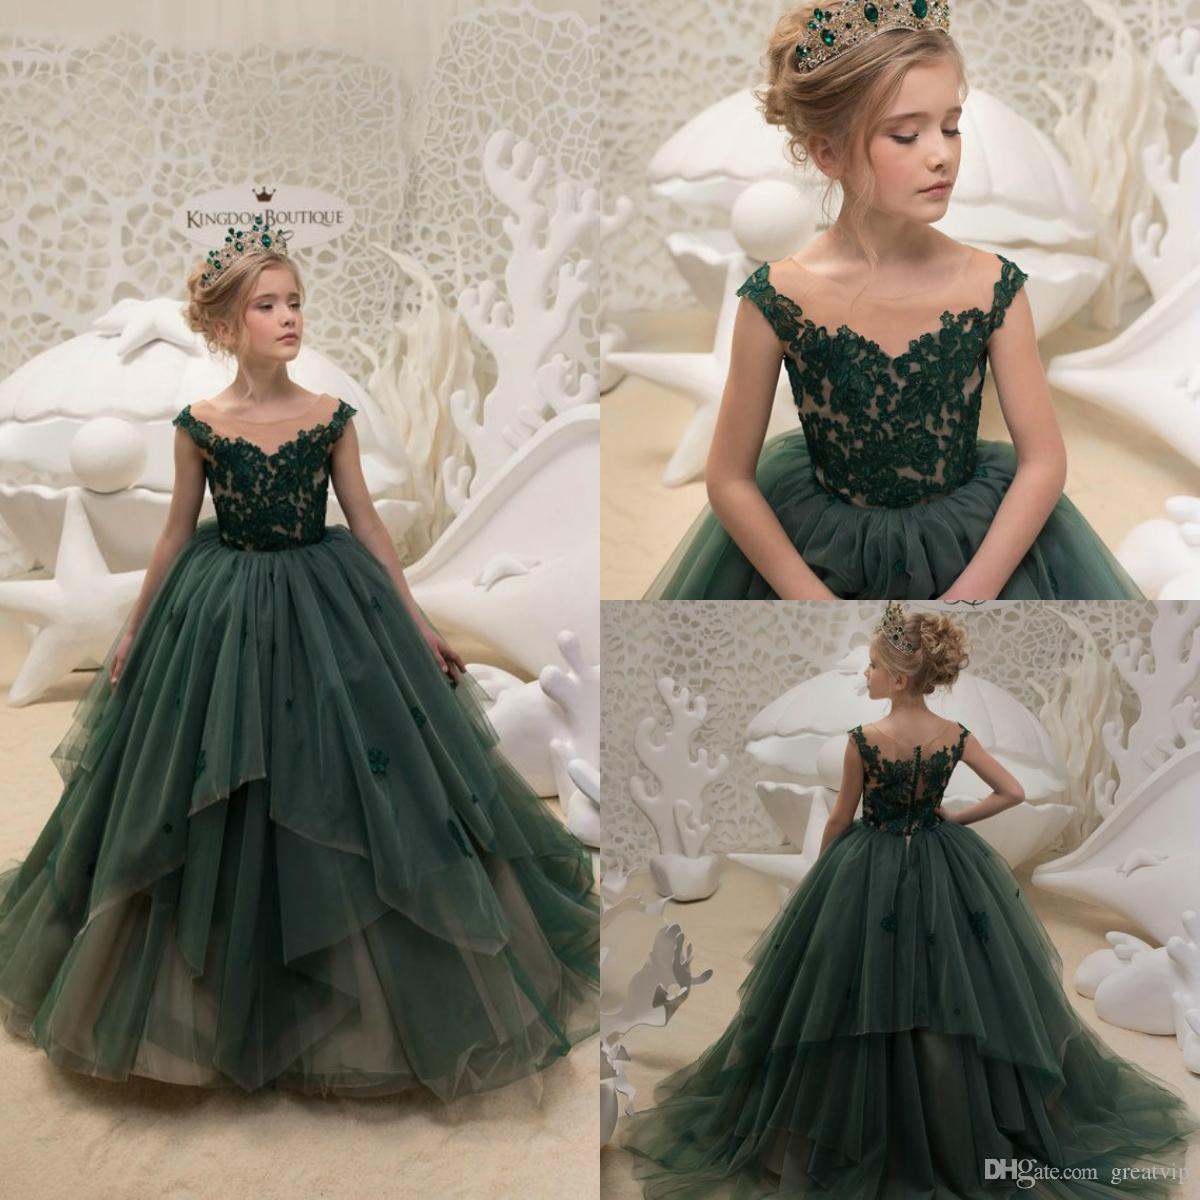 37628466aba Hunter Flower Girl Dresses Applique Ruffles Princess Party Kids Wedding  Dress Pageant First Communion Gowns Plus Size Robes De Fête Girls Ivory Dress  Girls ...